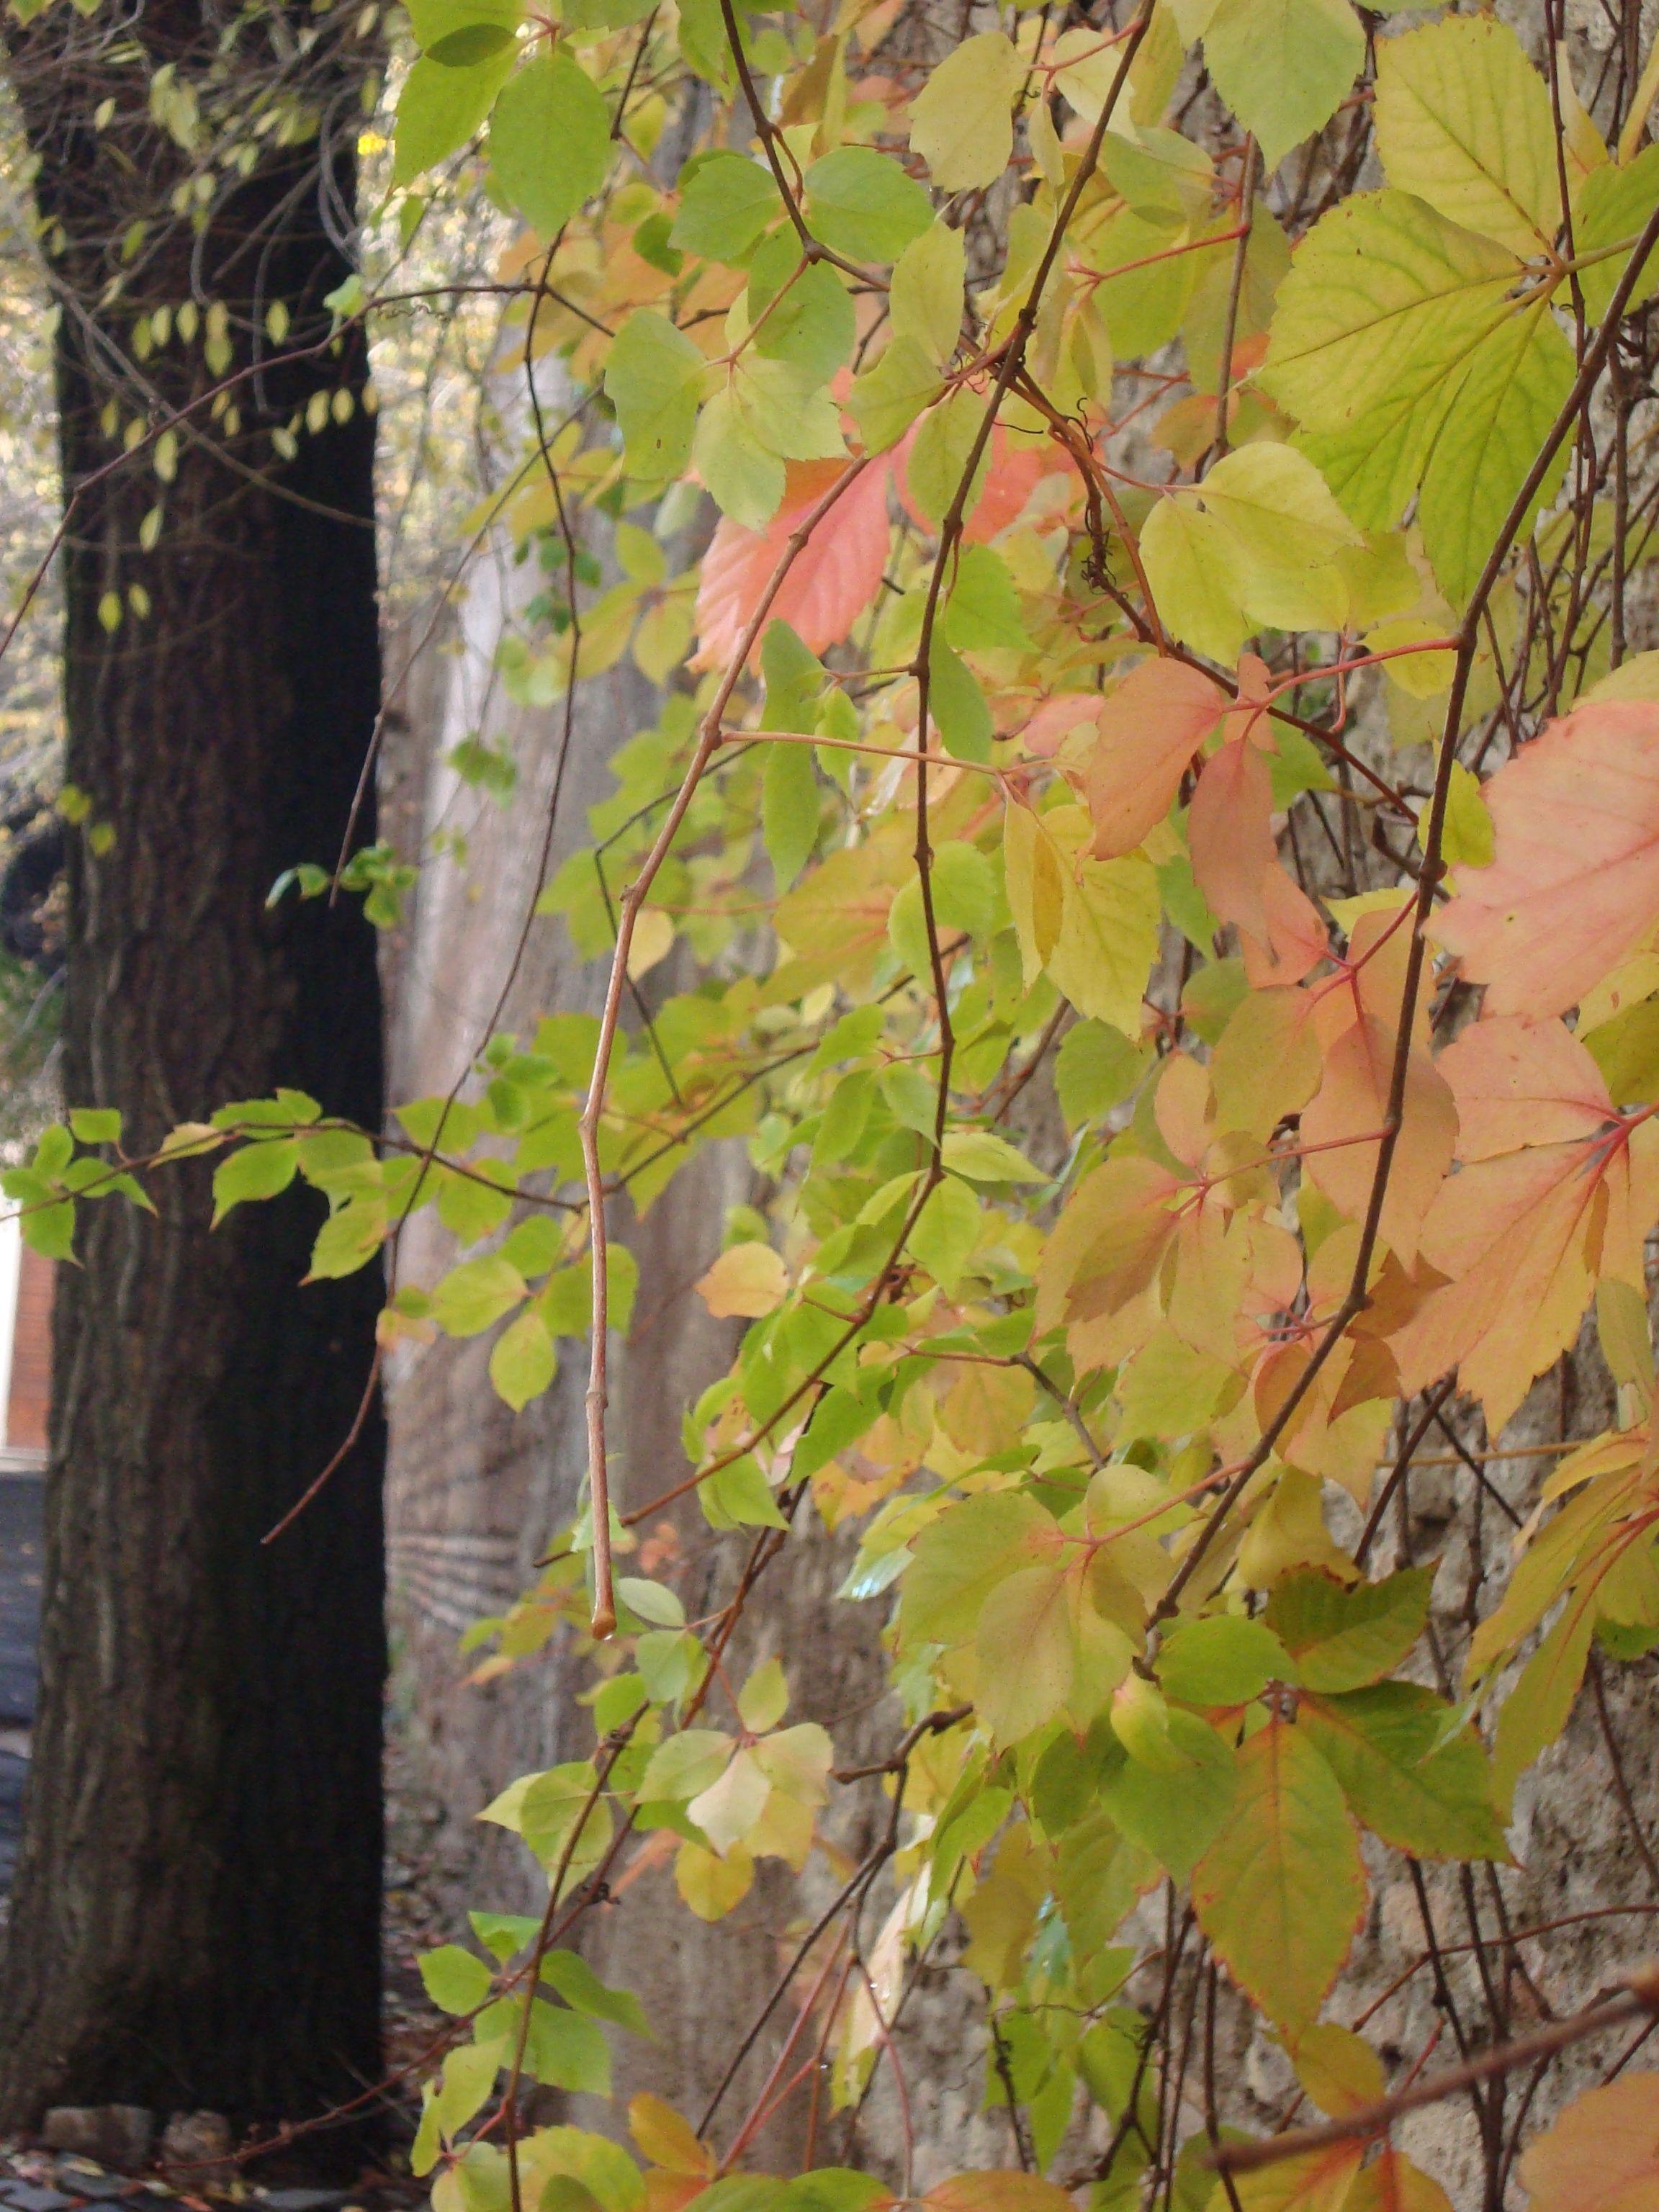 more colors of fall in december